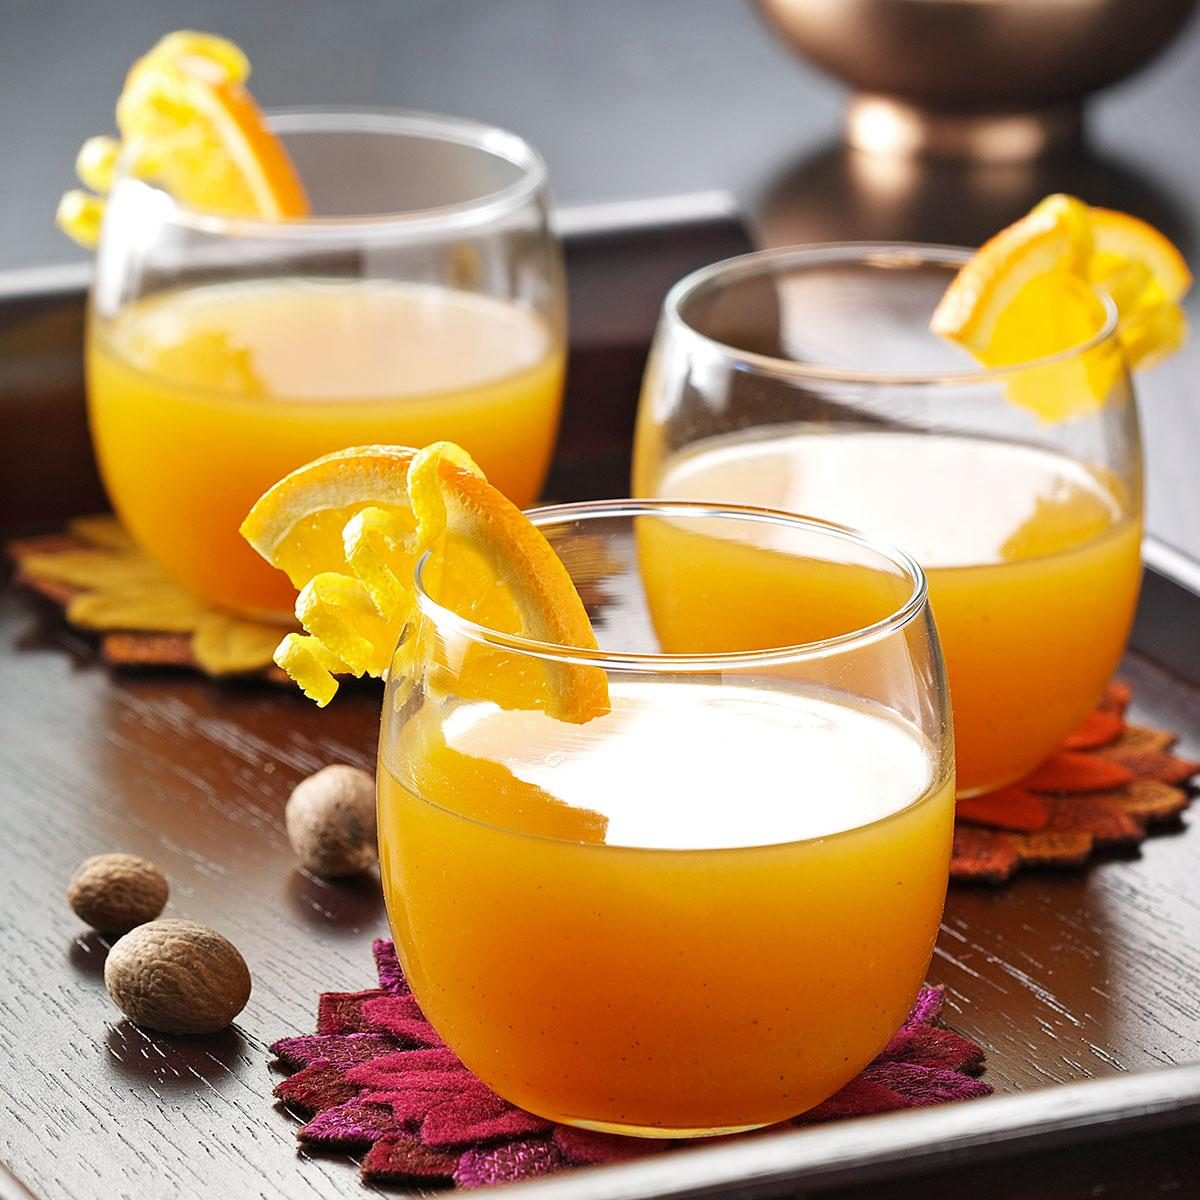 Spiced Ambrosia Punch Recipe